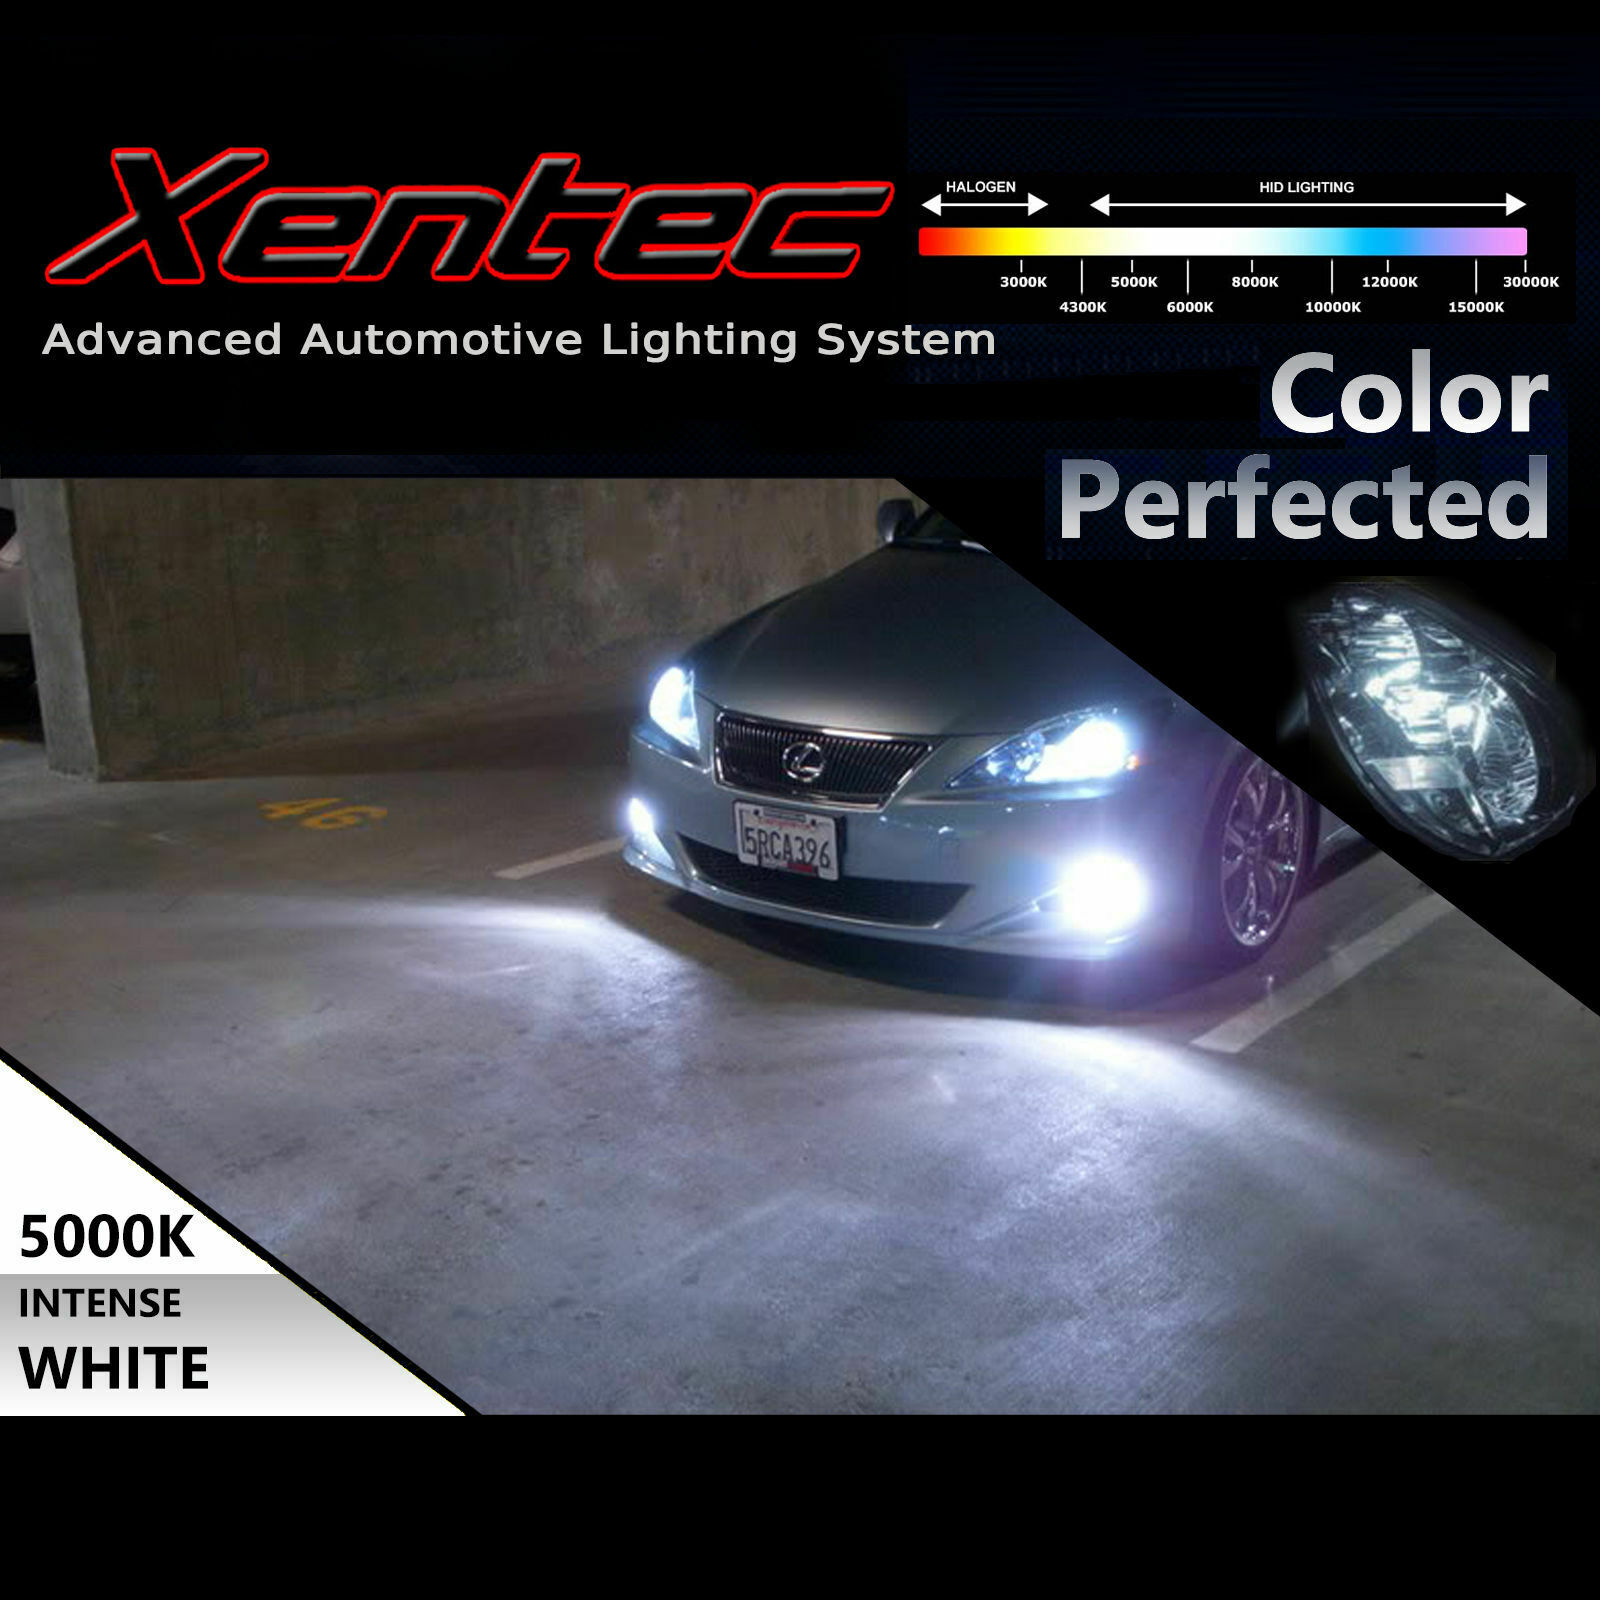 Xentec Xenon Headlight HID Kit for Honda Civic Accord H4 H11 9005 9006 880 H10 6